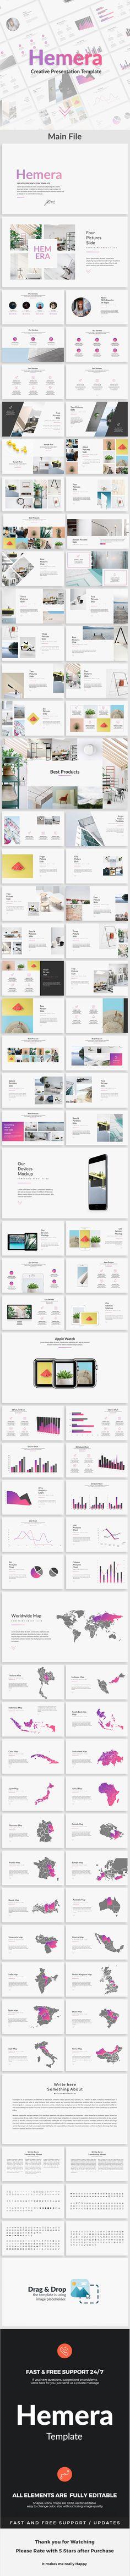 Hemera - Creative Powerpoint Template